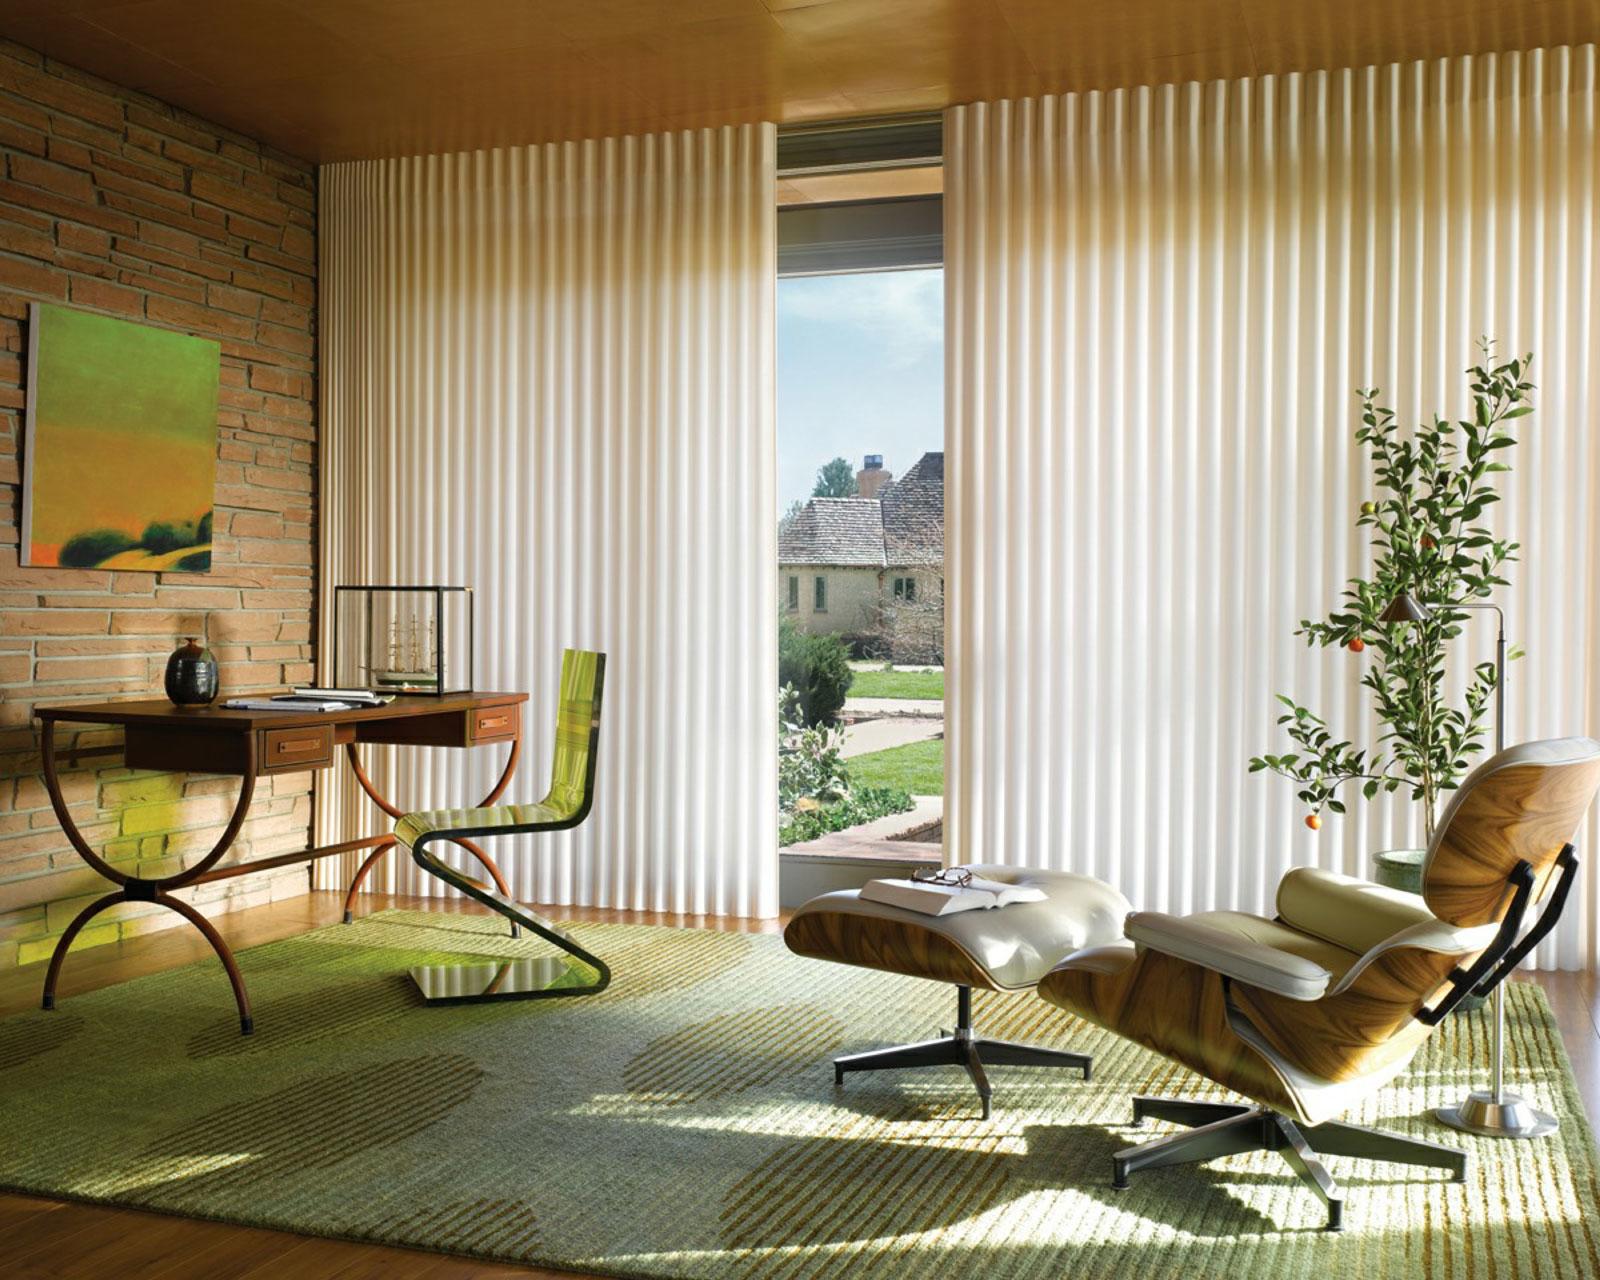 The Drapery Guy - Window Treatments Westlake Village image 10